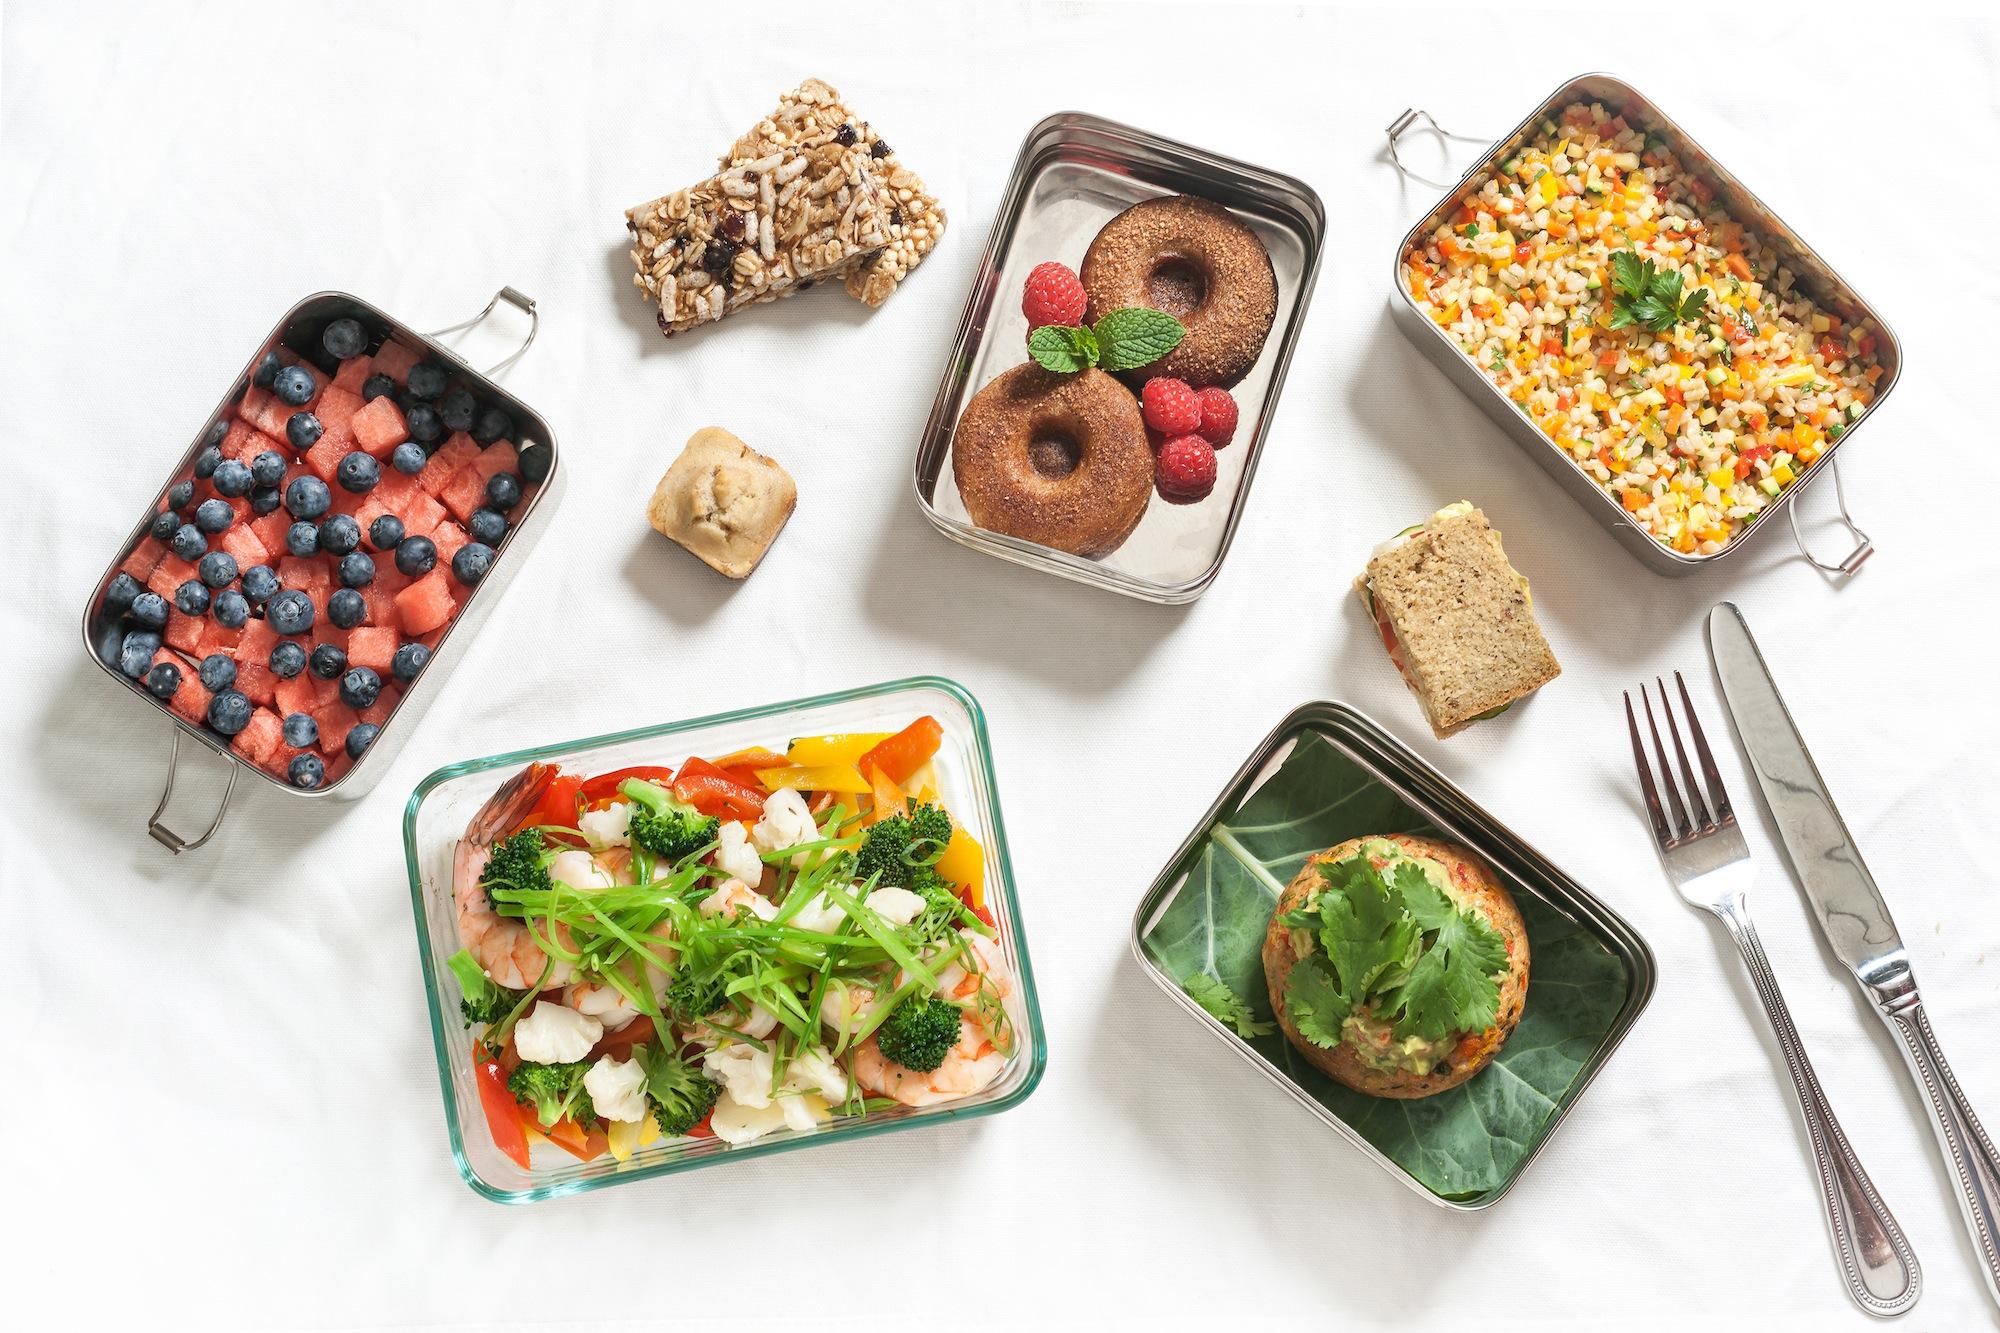 Food Preparation Business Plan